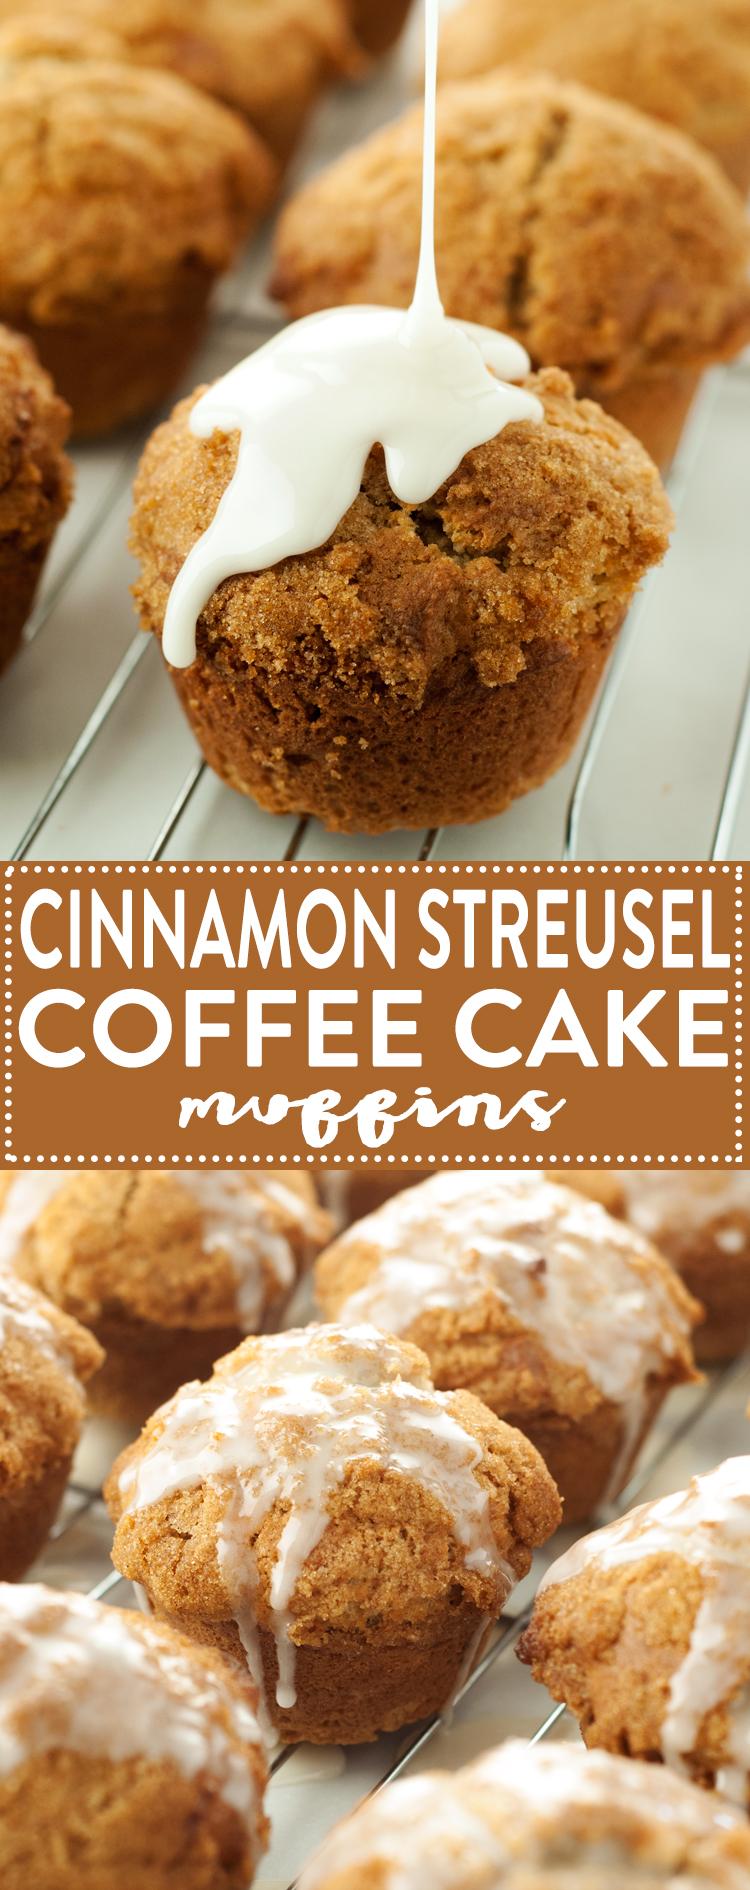 Cinnamon Streusel Coffee Cake Muffins | asimplepantry.com